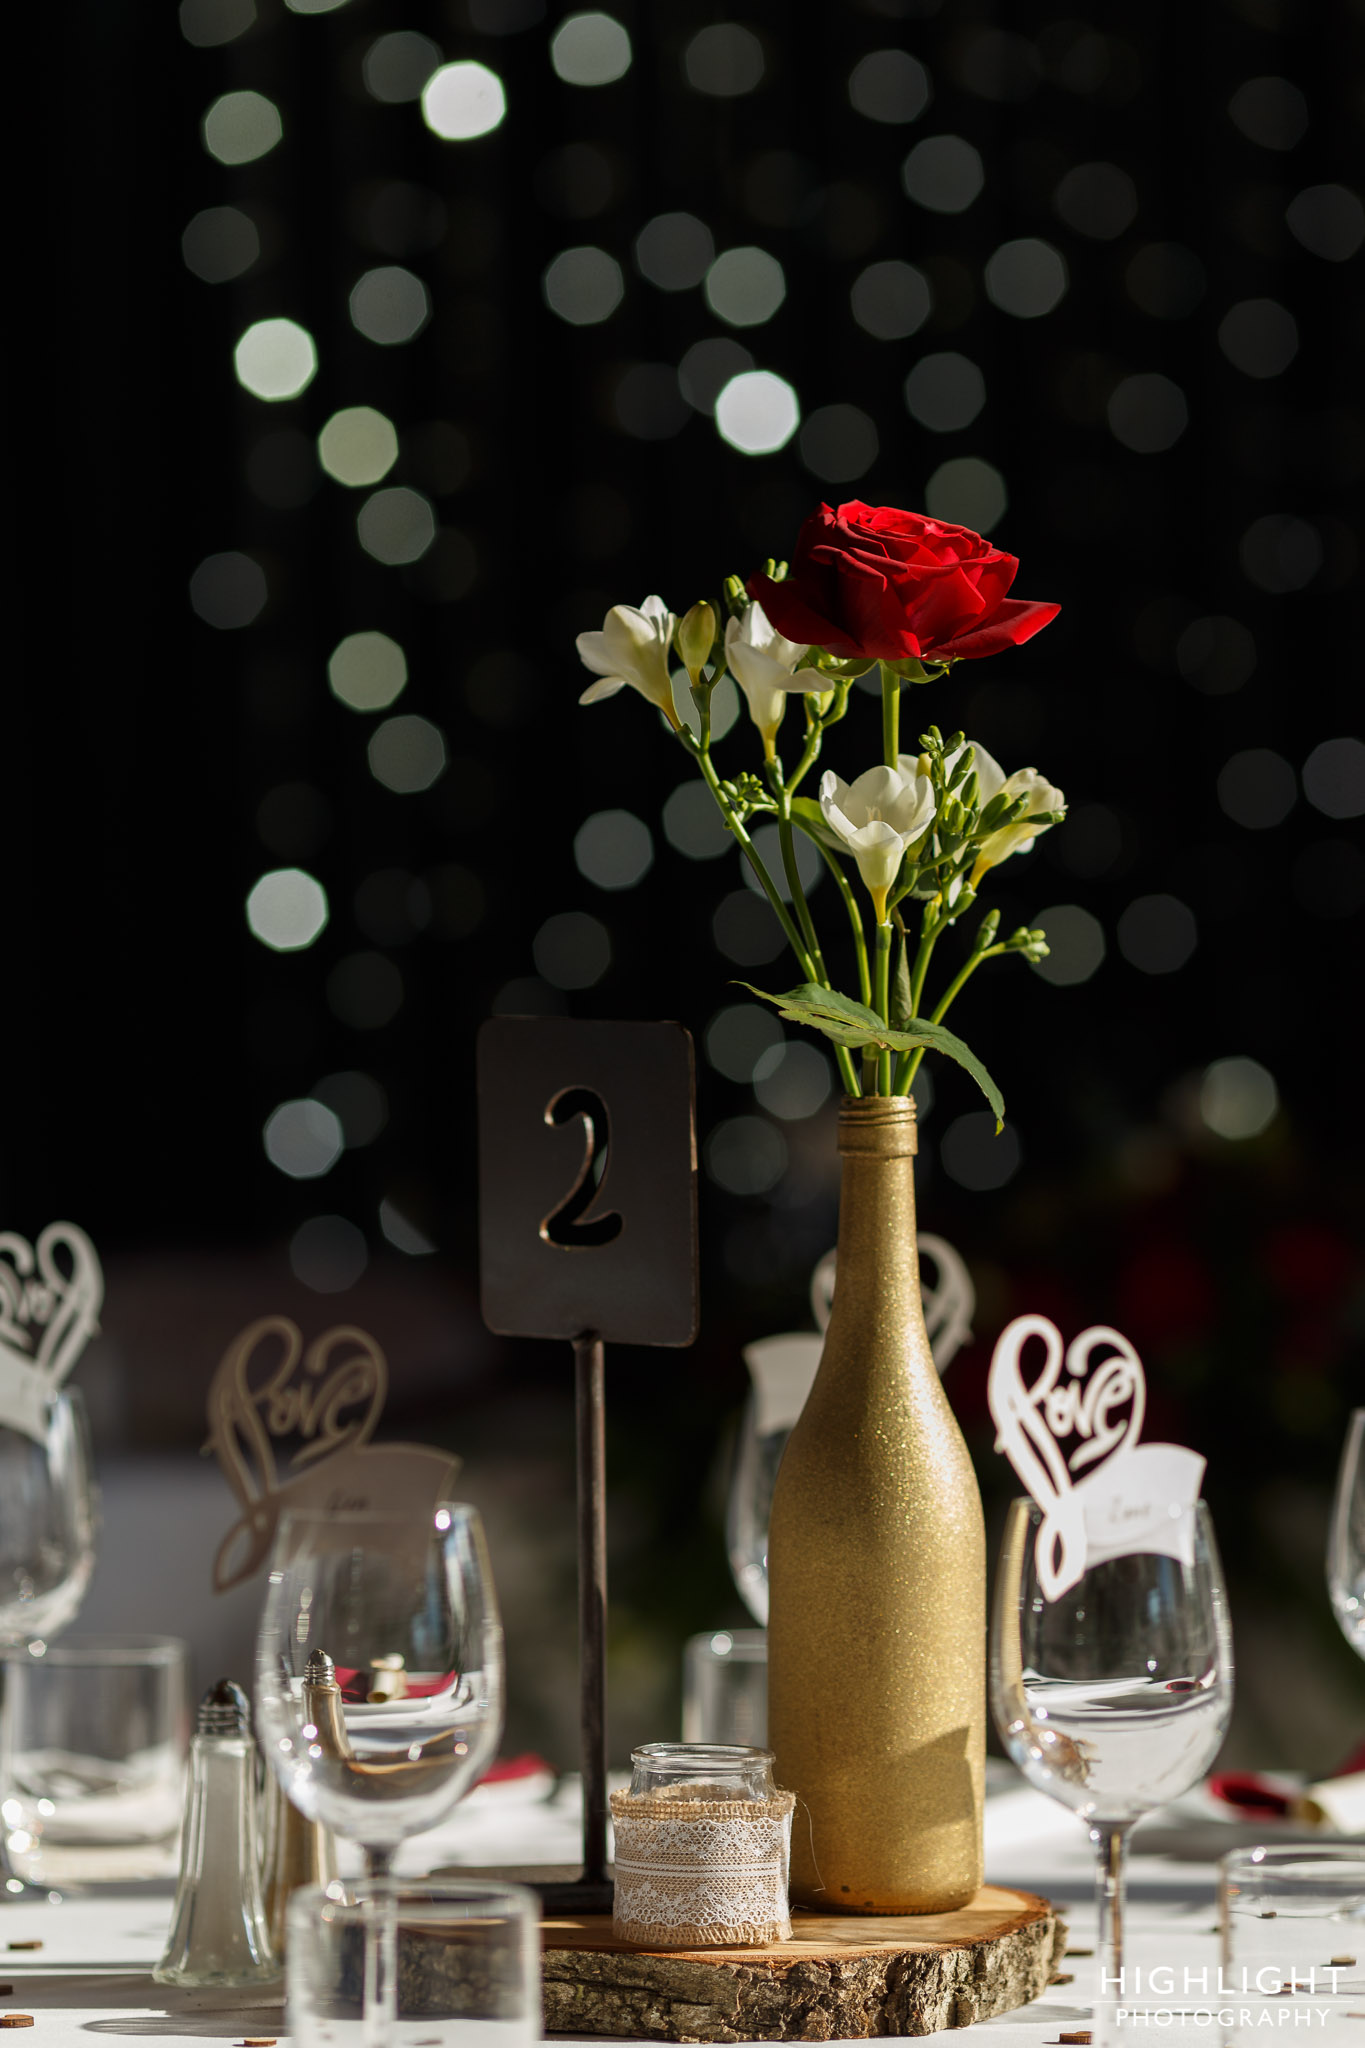 Highlight-wedding-photography-new-zealand-palmerston-north-14.jpg